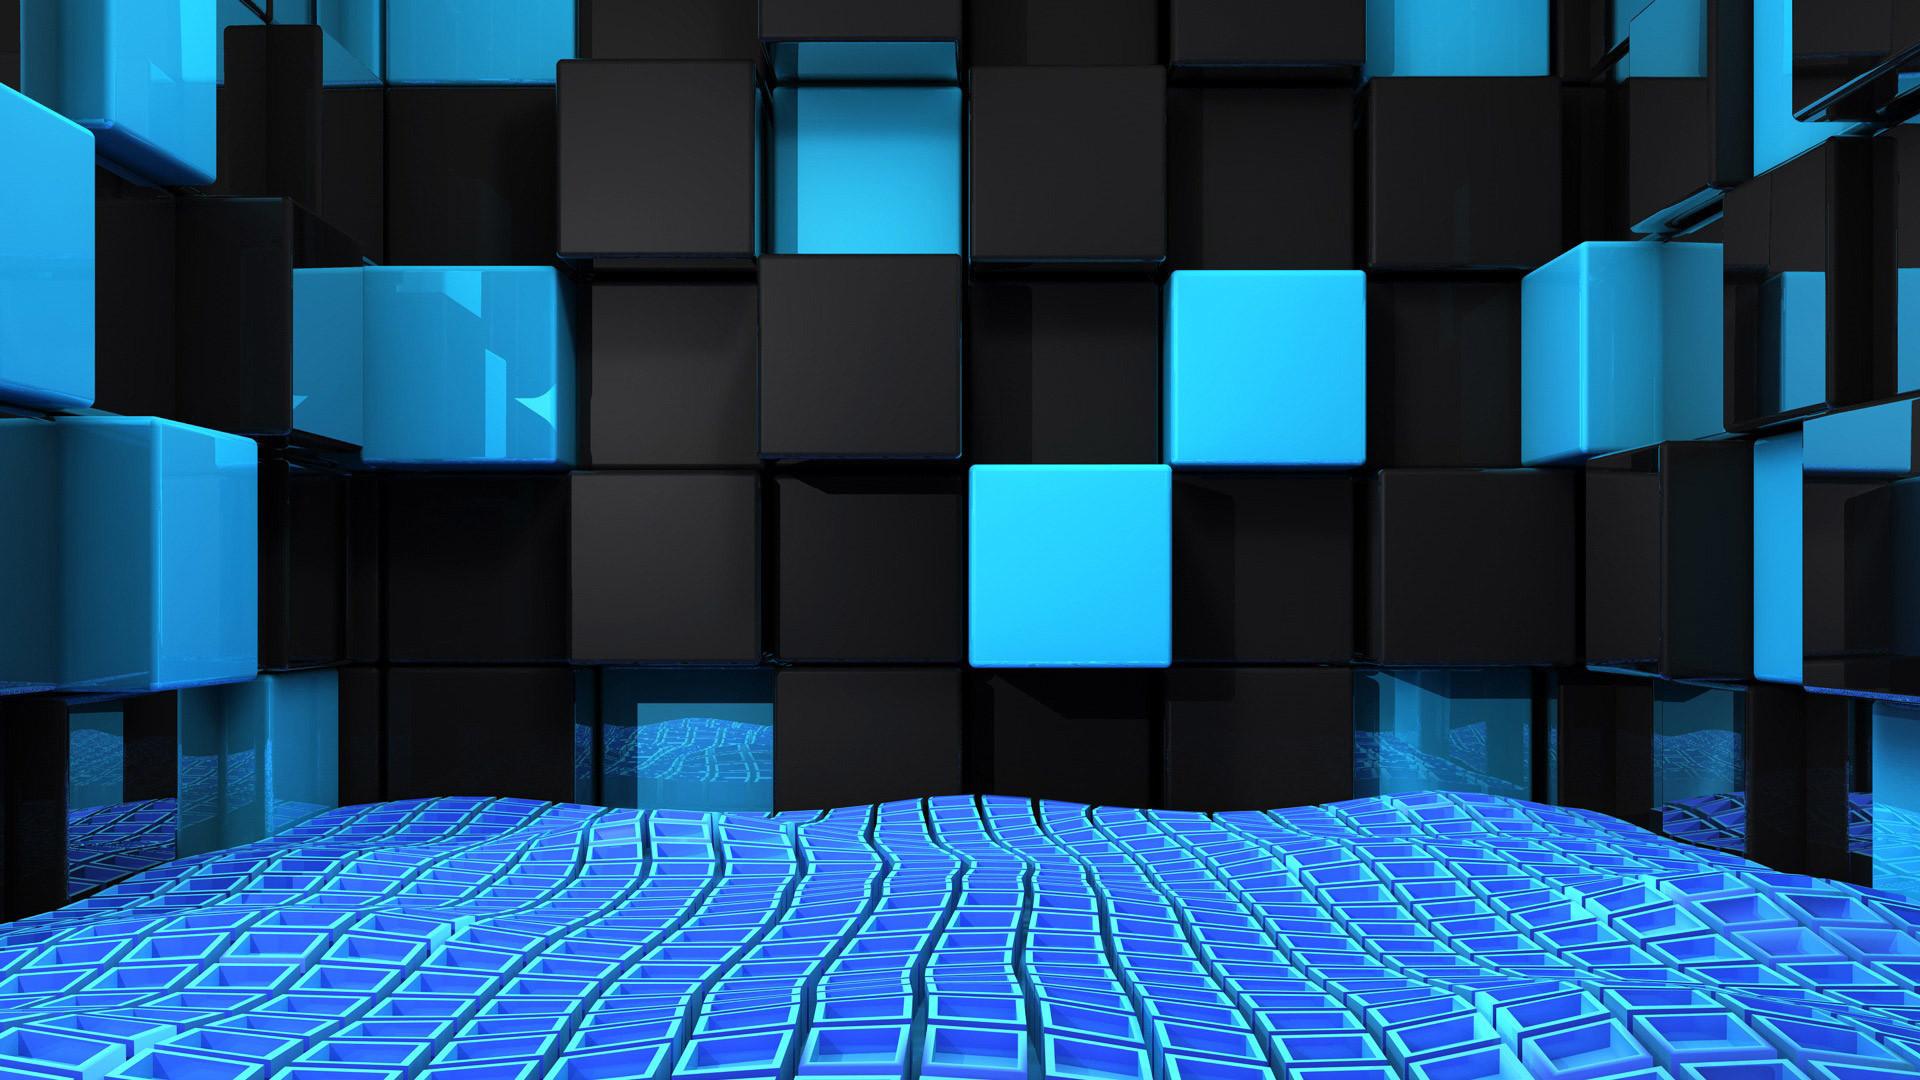 1920x1080 3D Wallpaper Hd For Laptop Desktop Background 13 HD Wallpapers